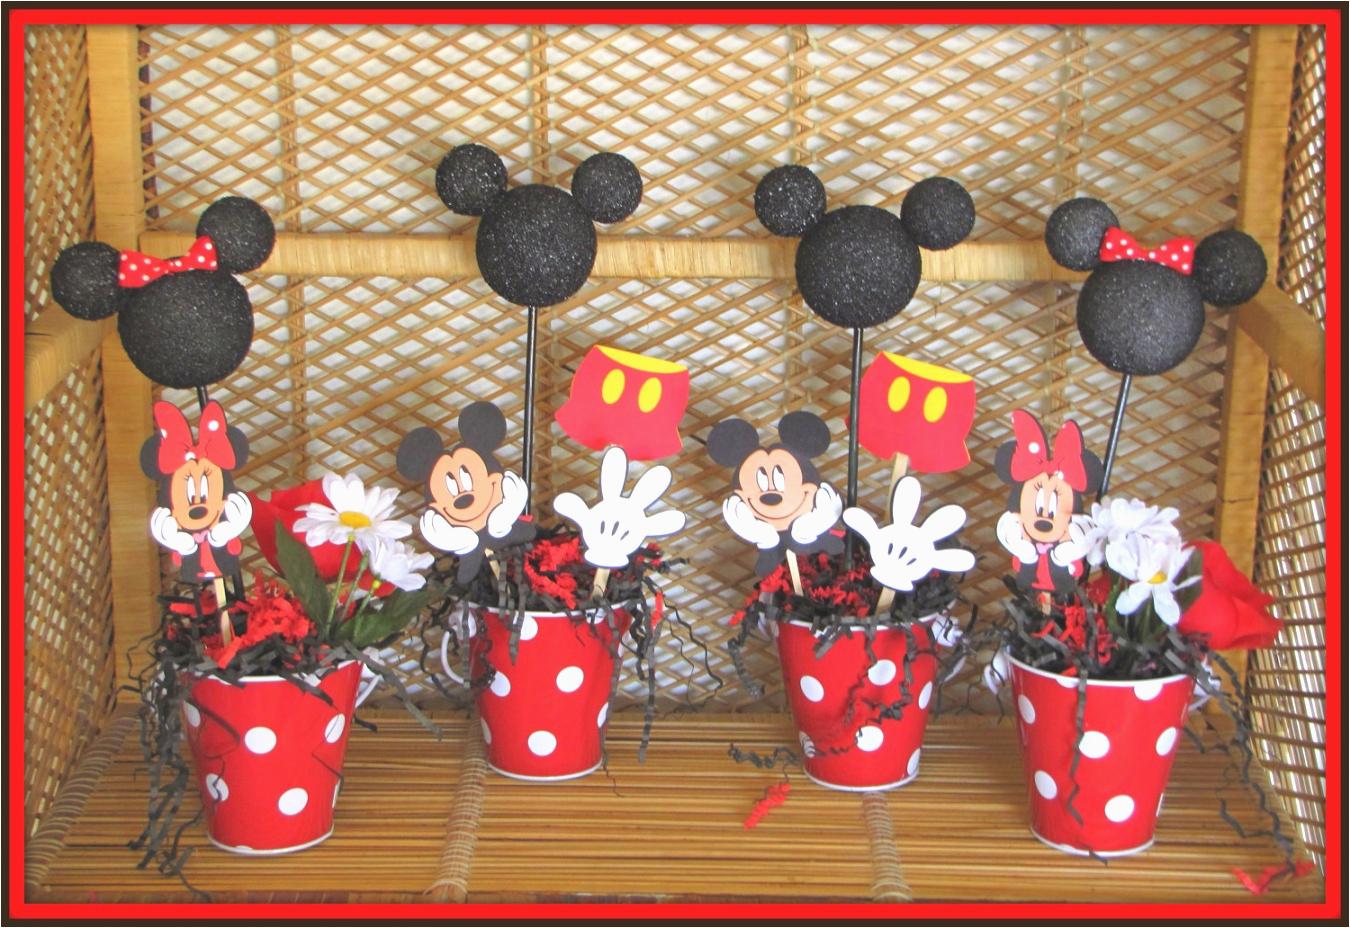 mickey minnie mouse birthday cake decorations tierra este 35016 mickey mouse party theme decorations